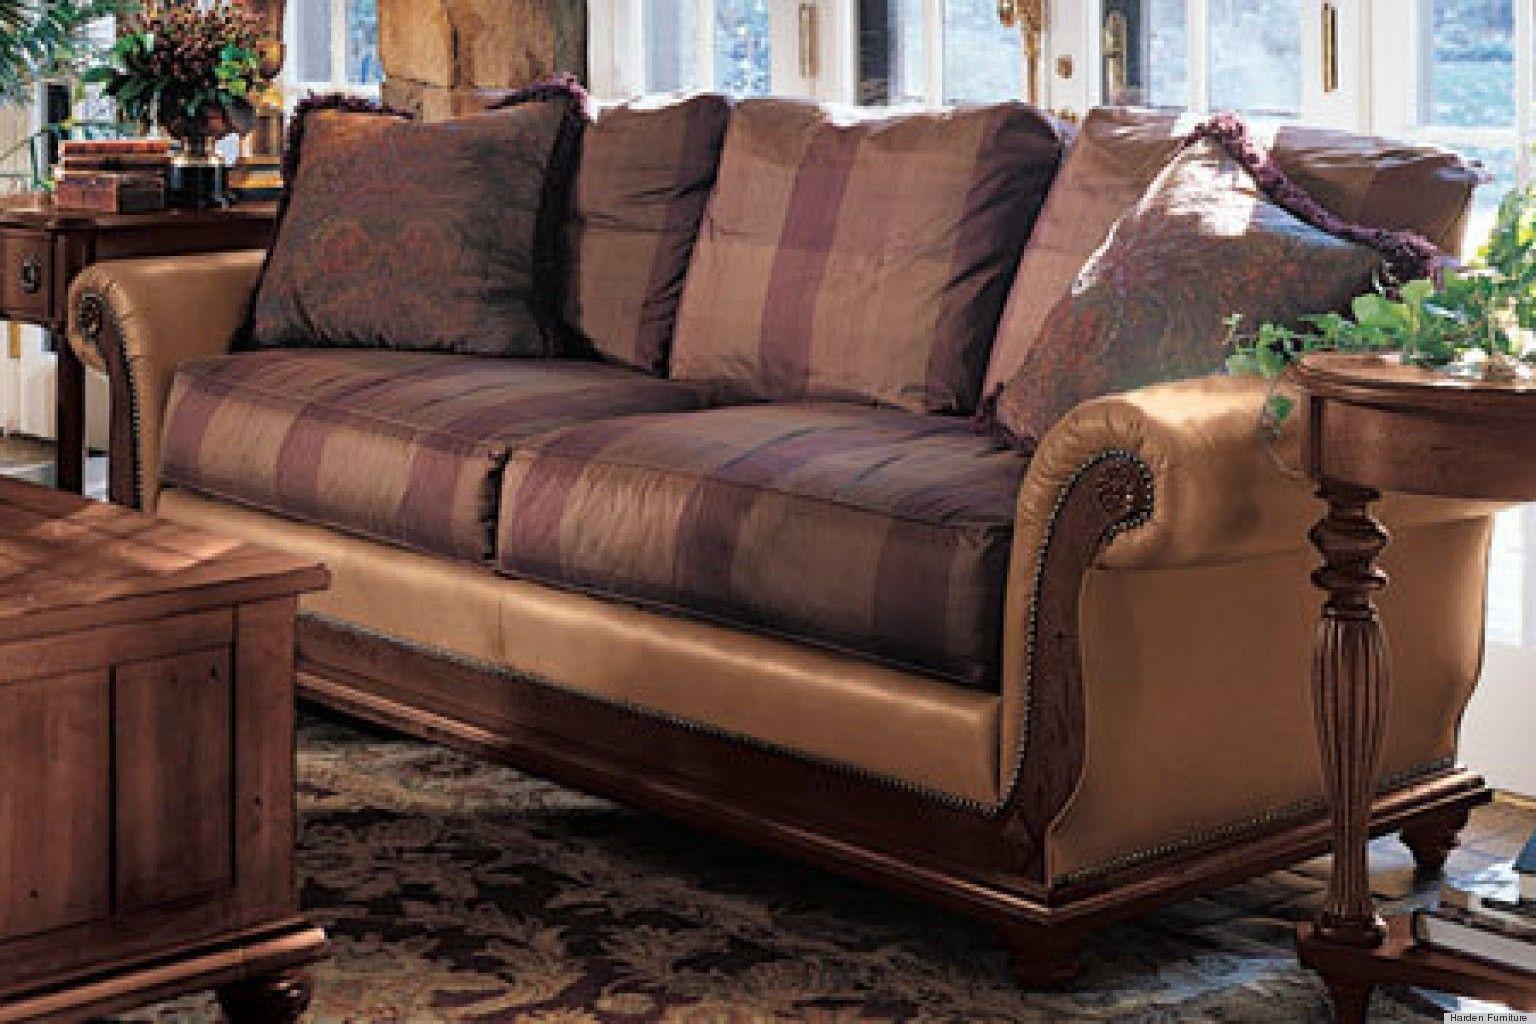 Sectional Sofa: Sectional Sofas On Craigslist Church ...